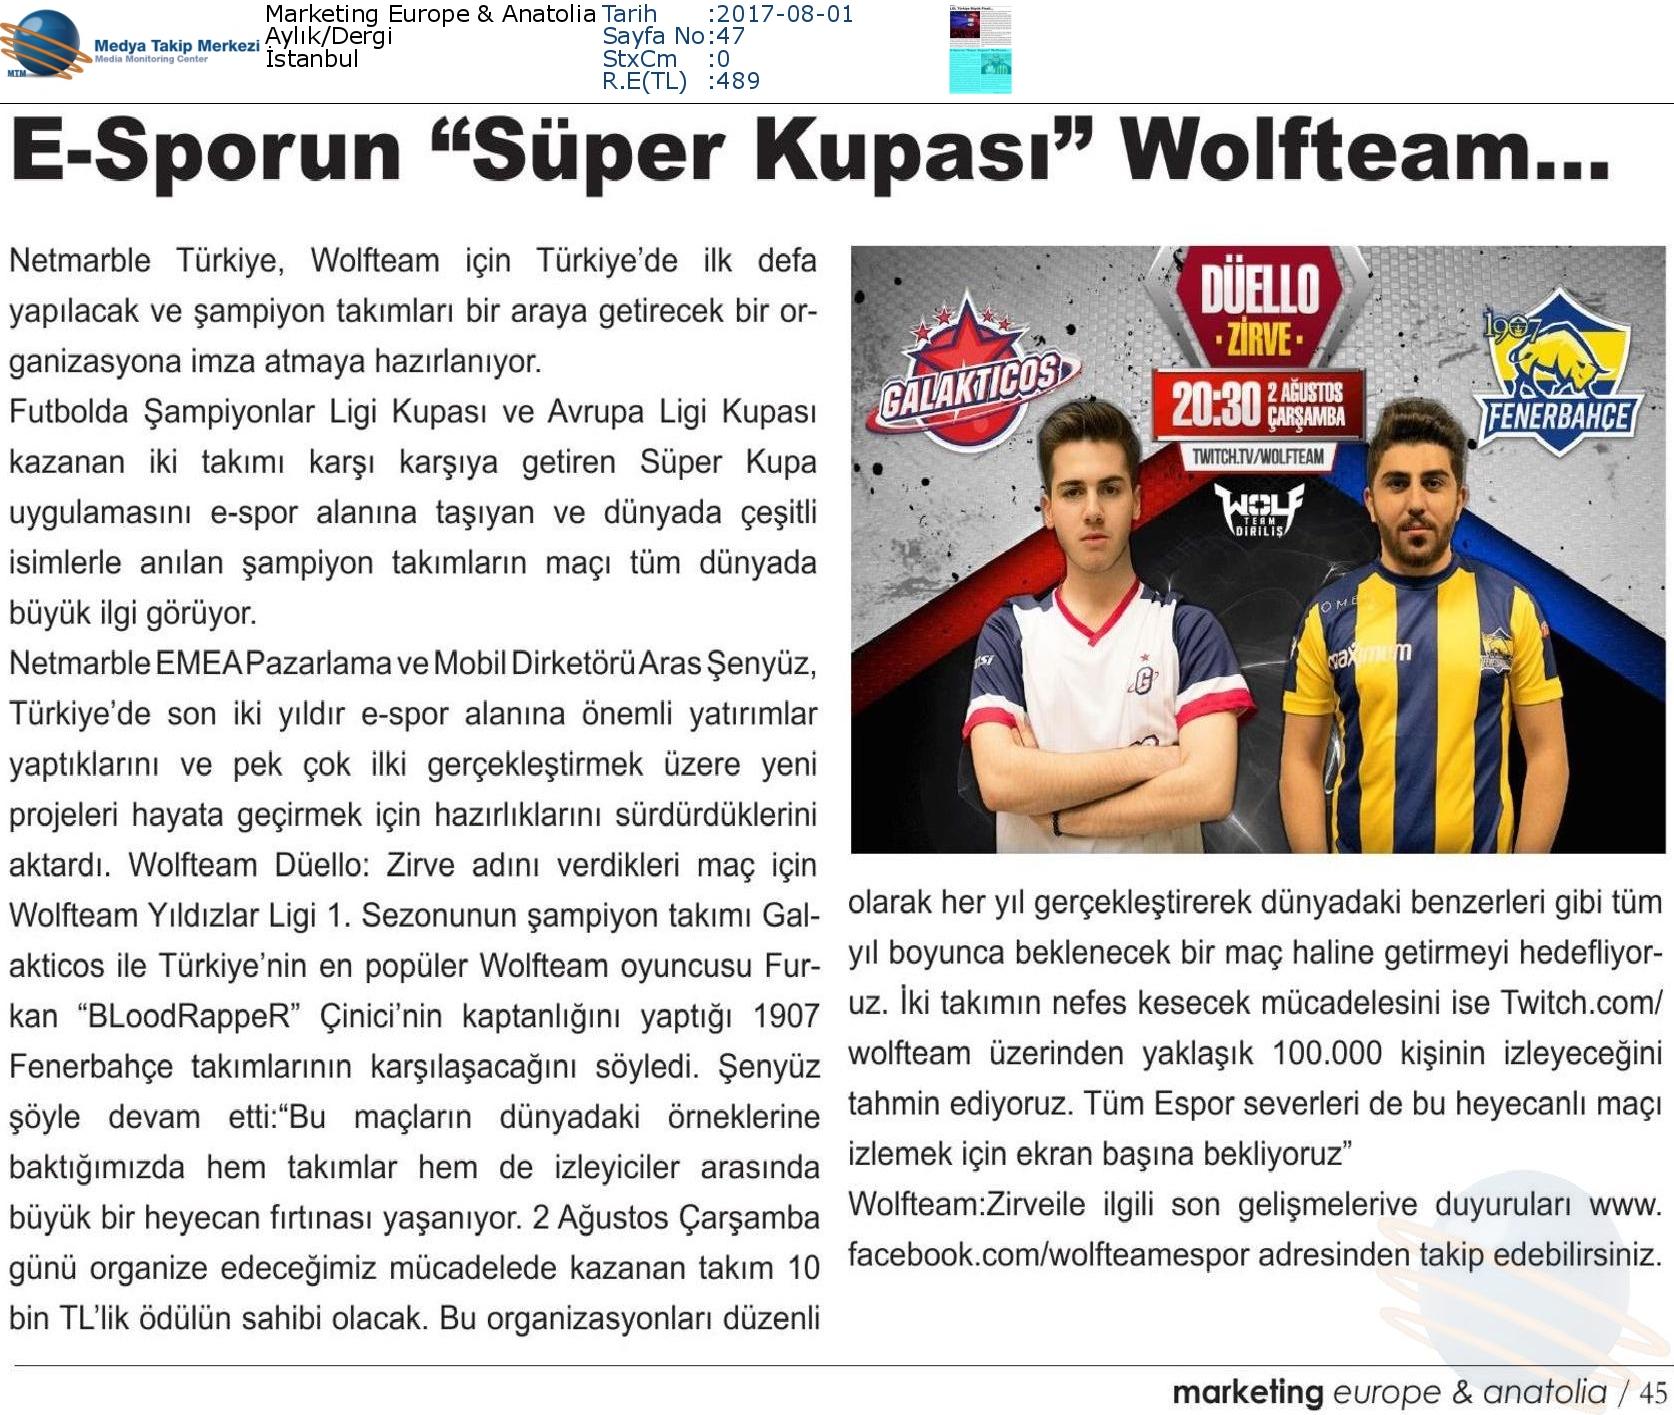 Marketing_Europe__Anatolia-E-SPORUN_SÜPER_KUPASI_VVOLFTEAM...-01.08.20171